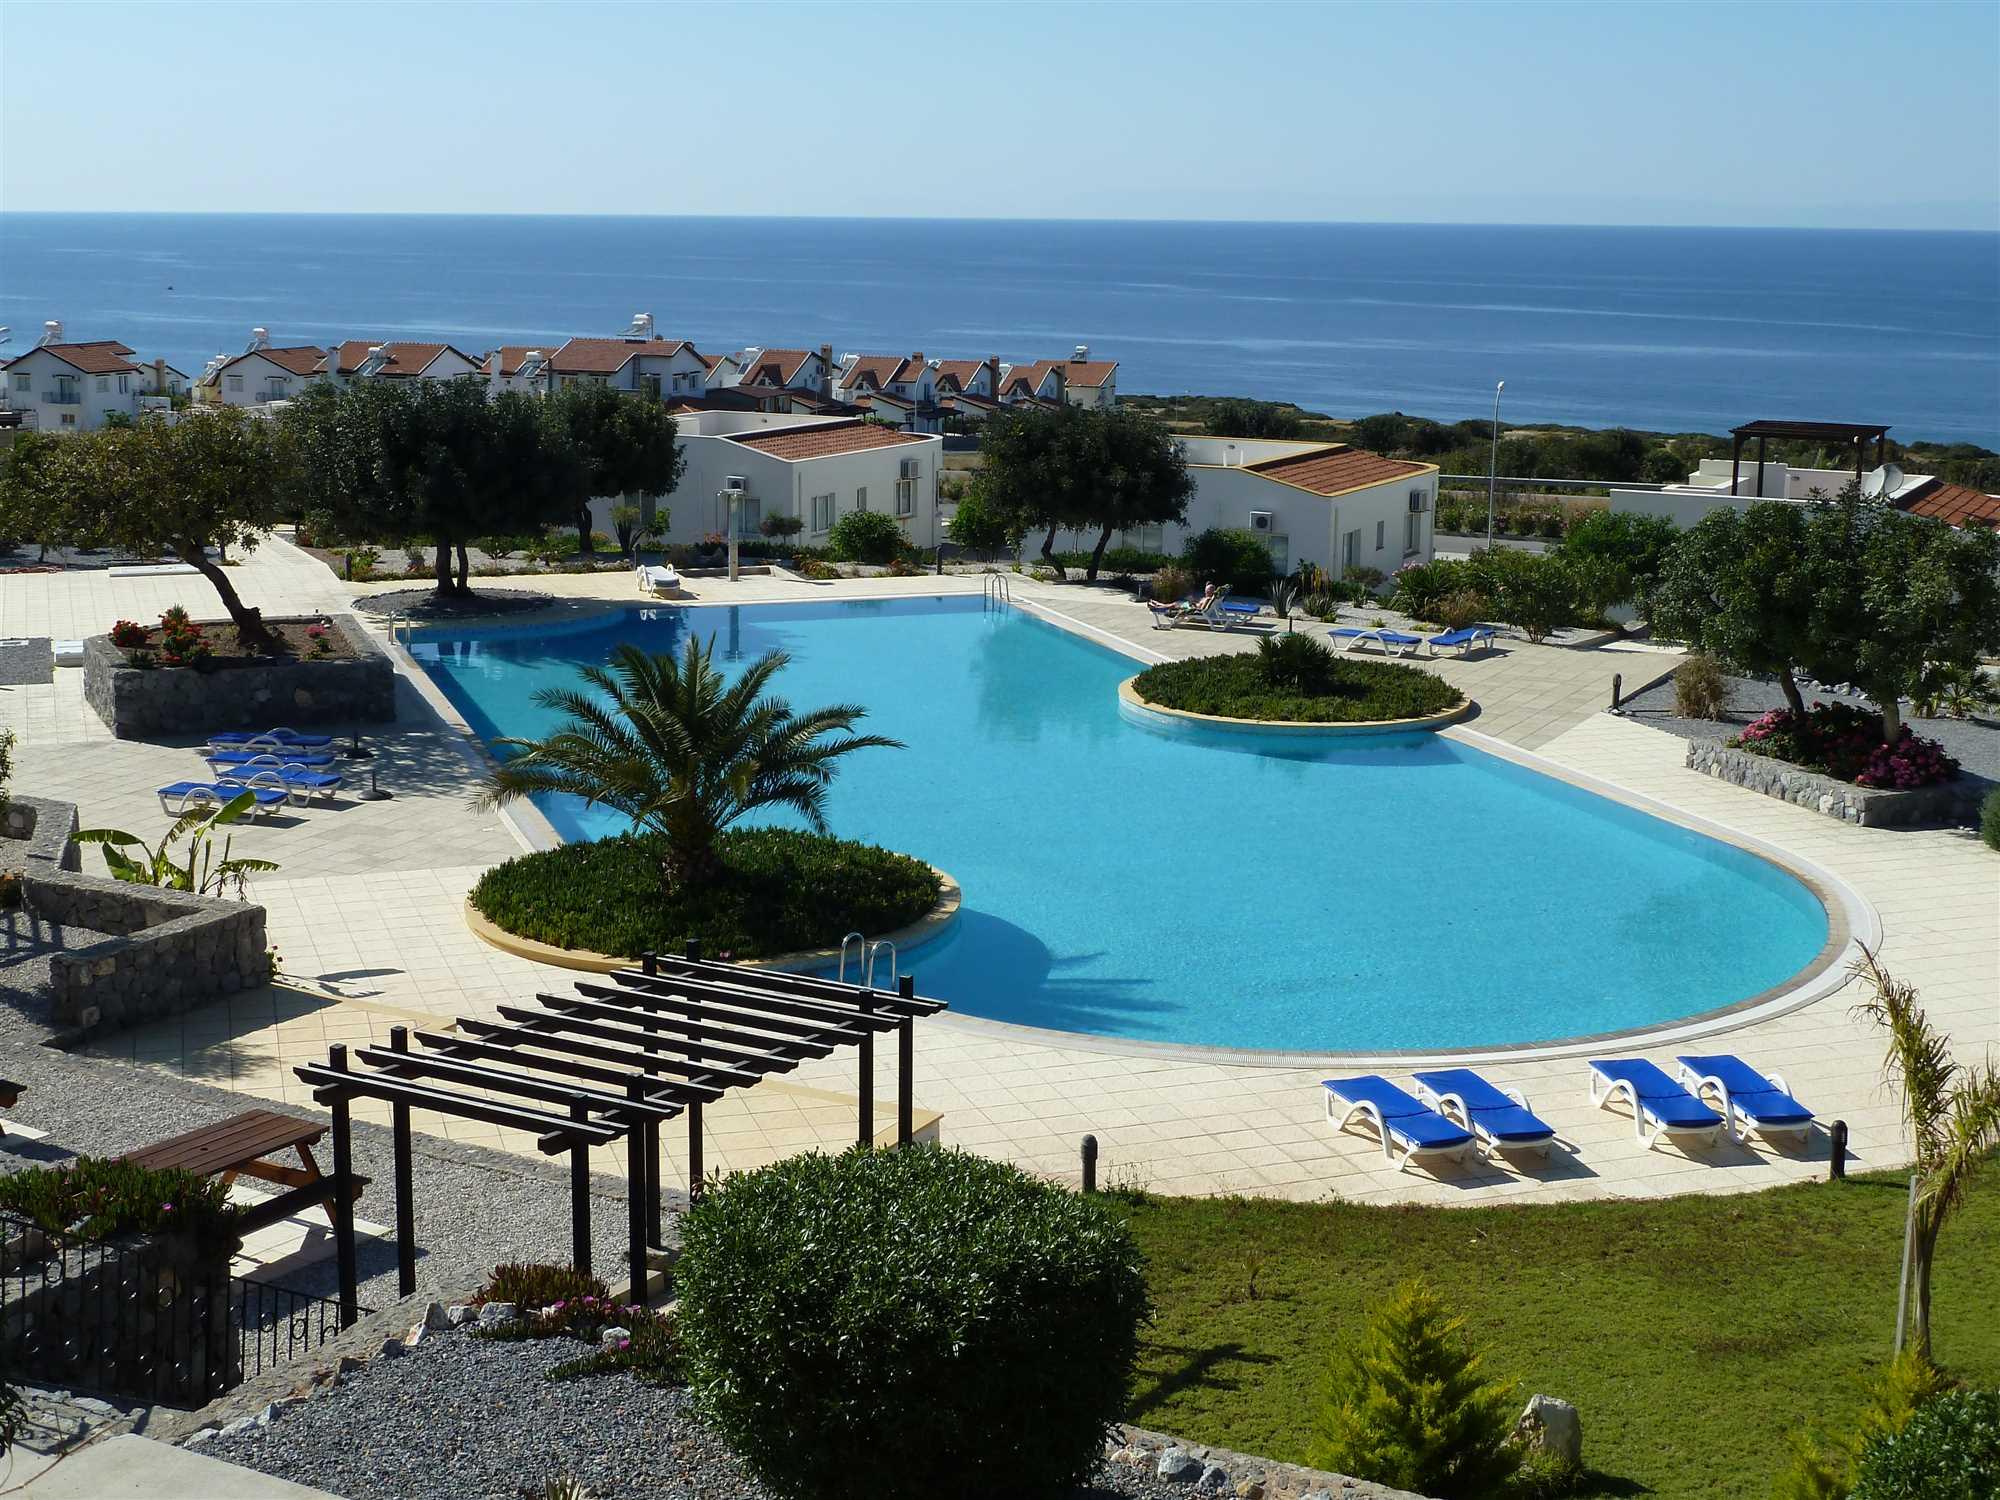 Cyprus Esentepe